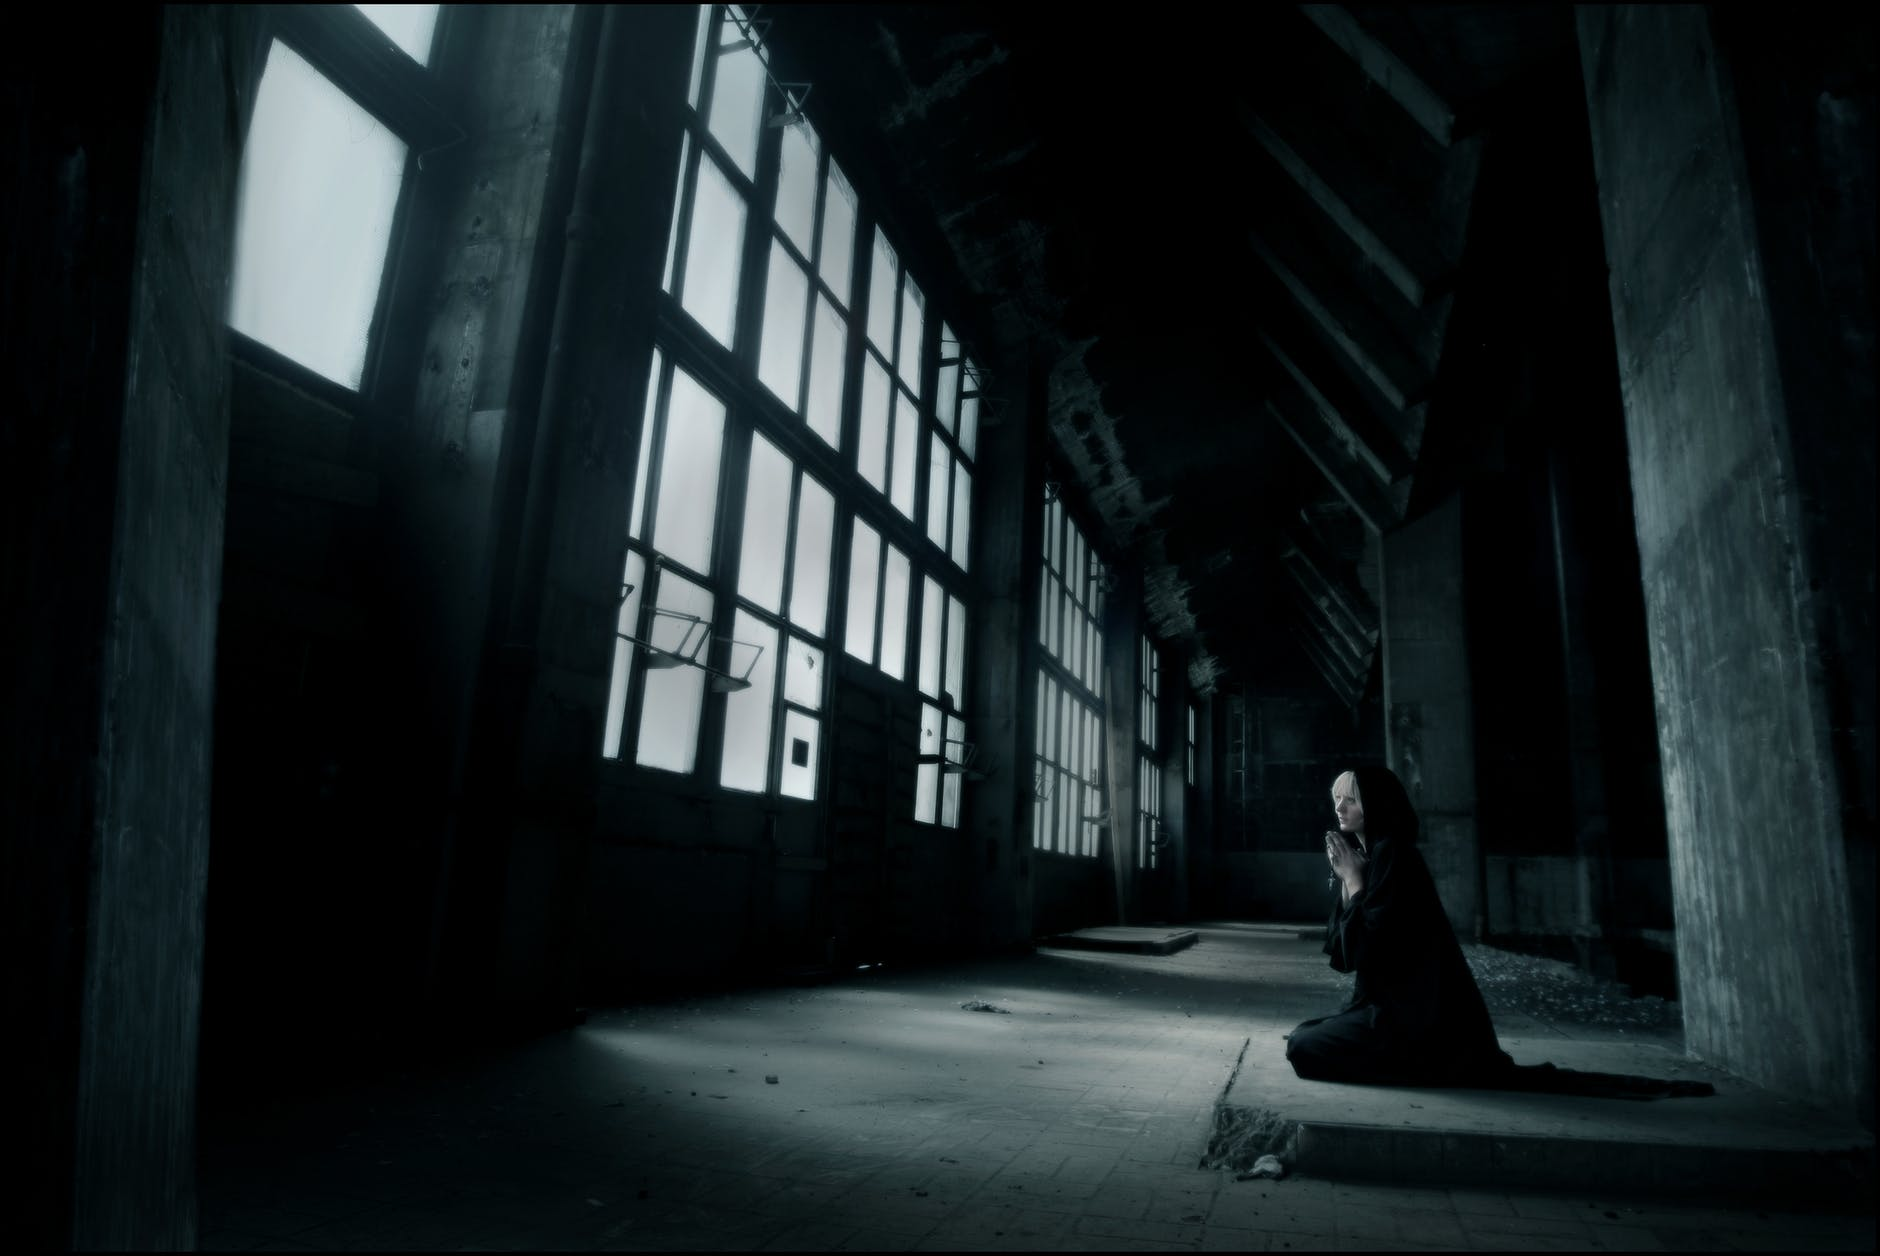 woman praying inside building